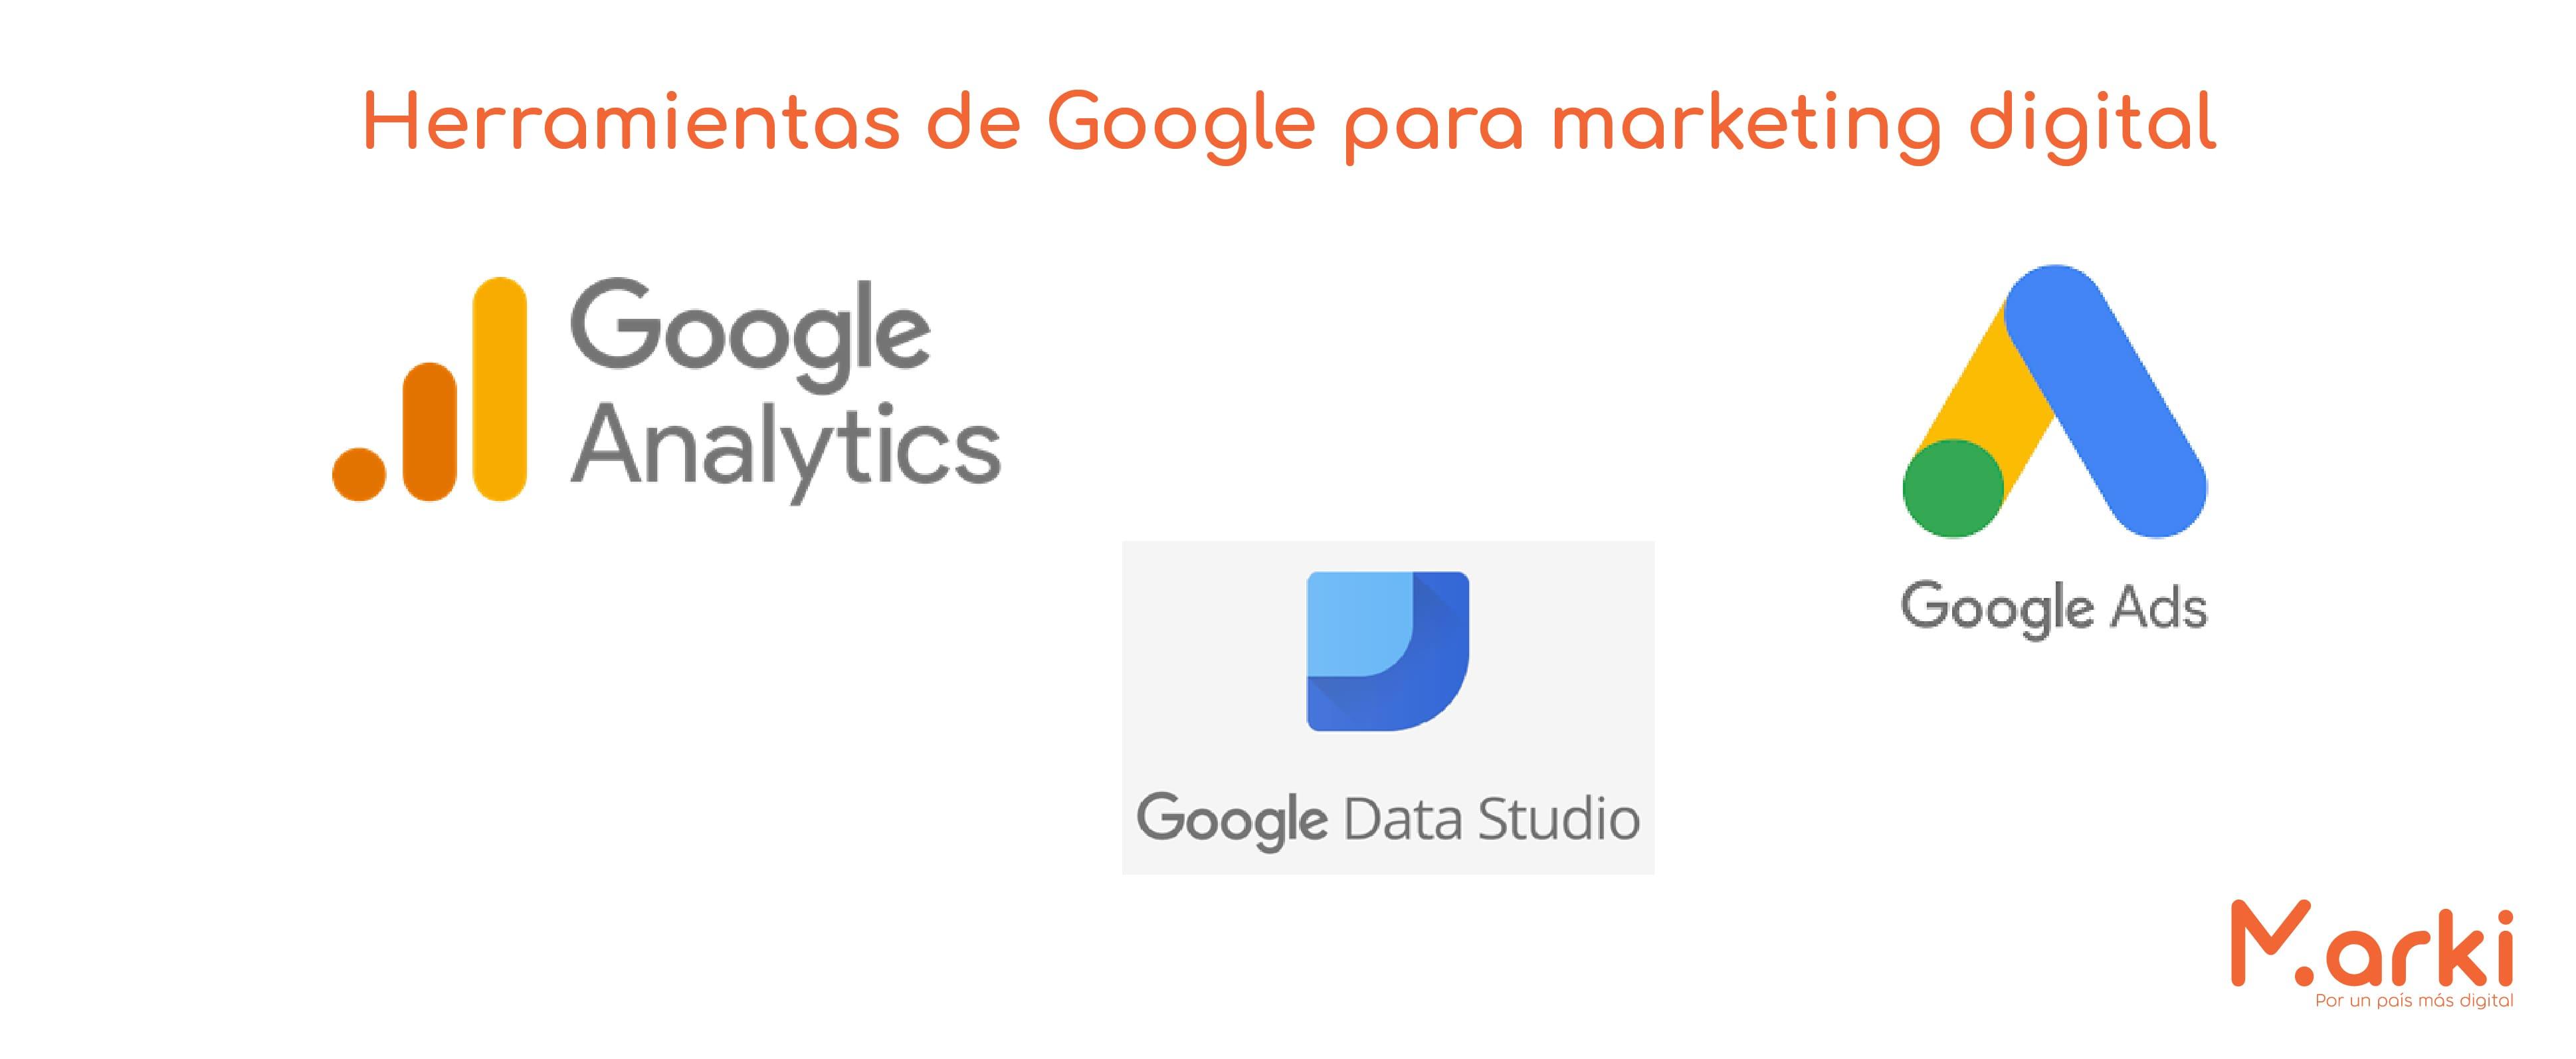 herramientas de google facebook como herramienta de marketing digital herramientas de marketing digital herramientas de facebook para marketing digital marketing digital para emprendedores voluntariado marki diseño marki marki blog ¿Cuáles son las herramientas de marketing digital? ¿Cuáles son las herramientas digitales más usadas?